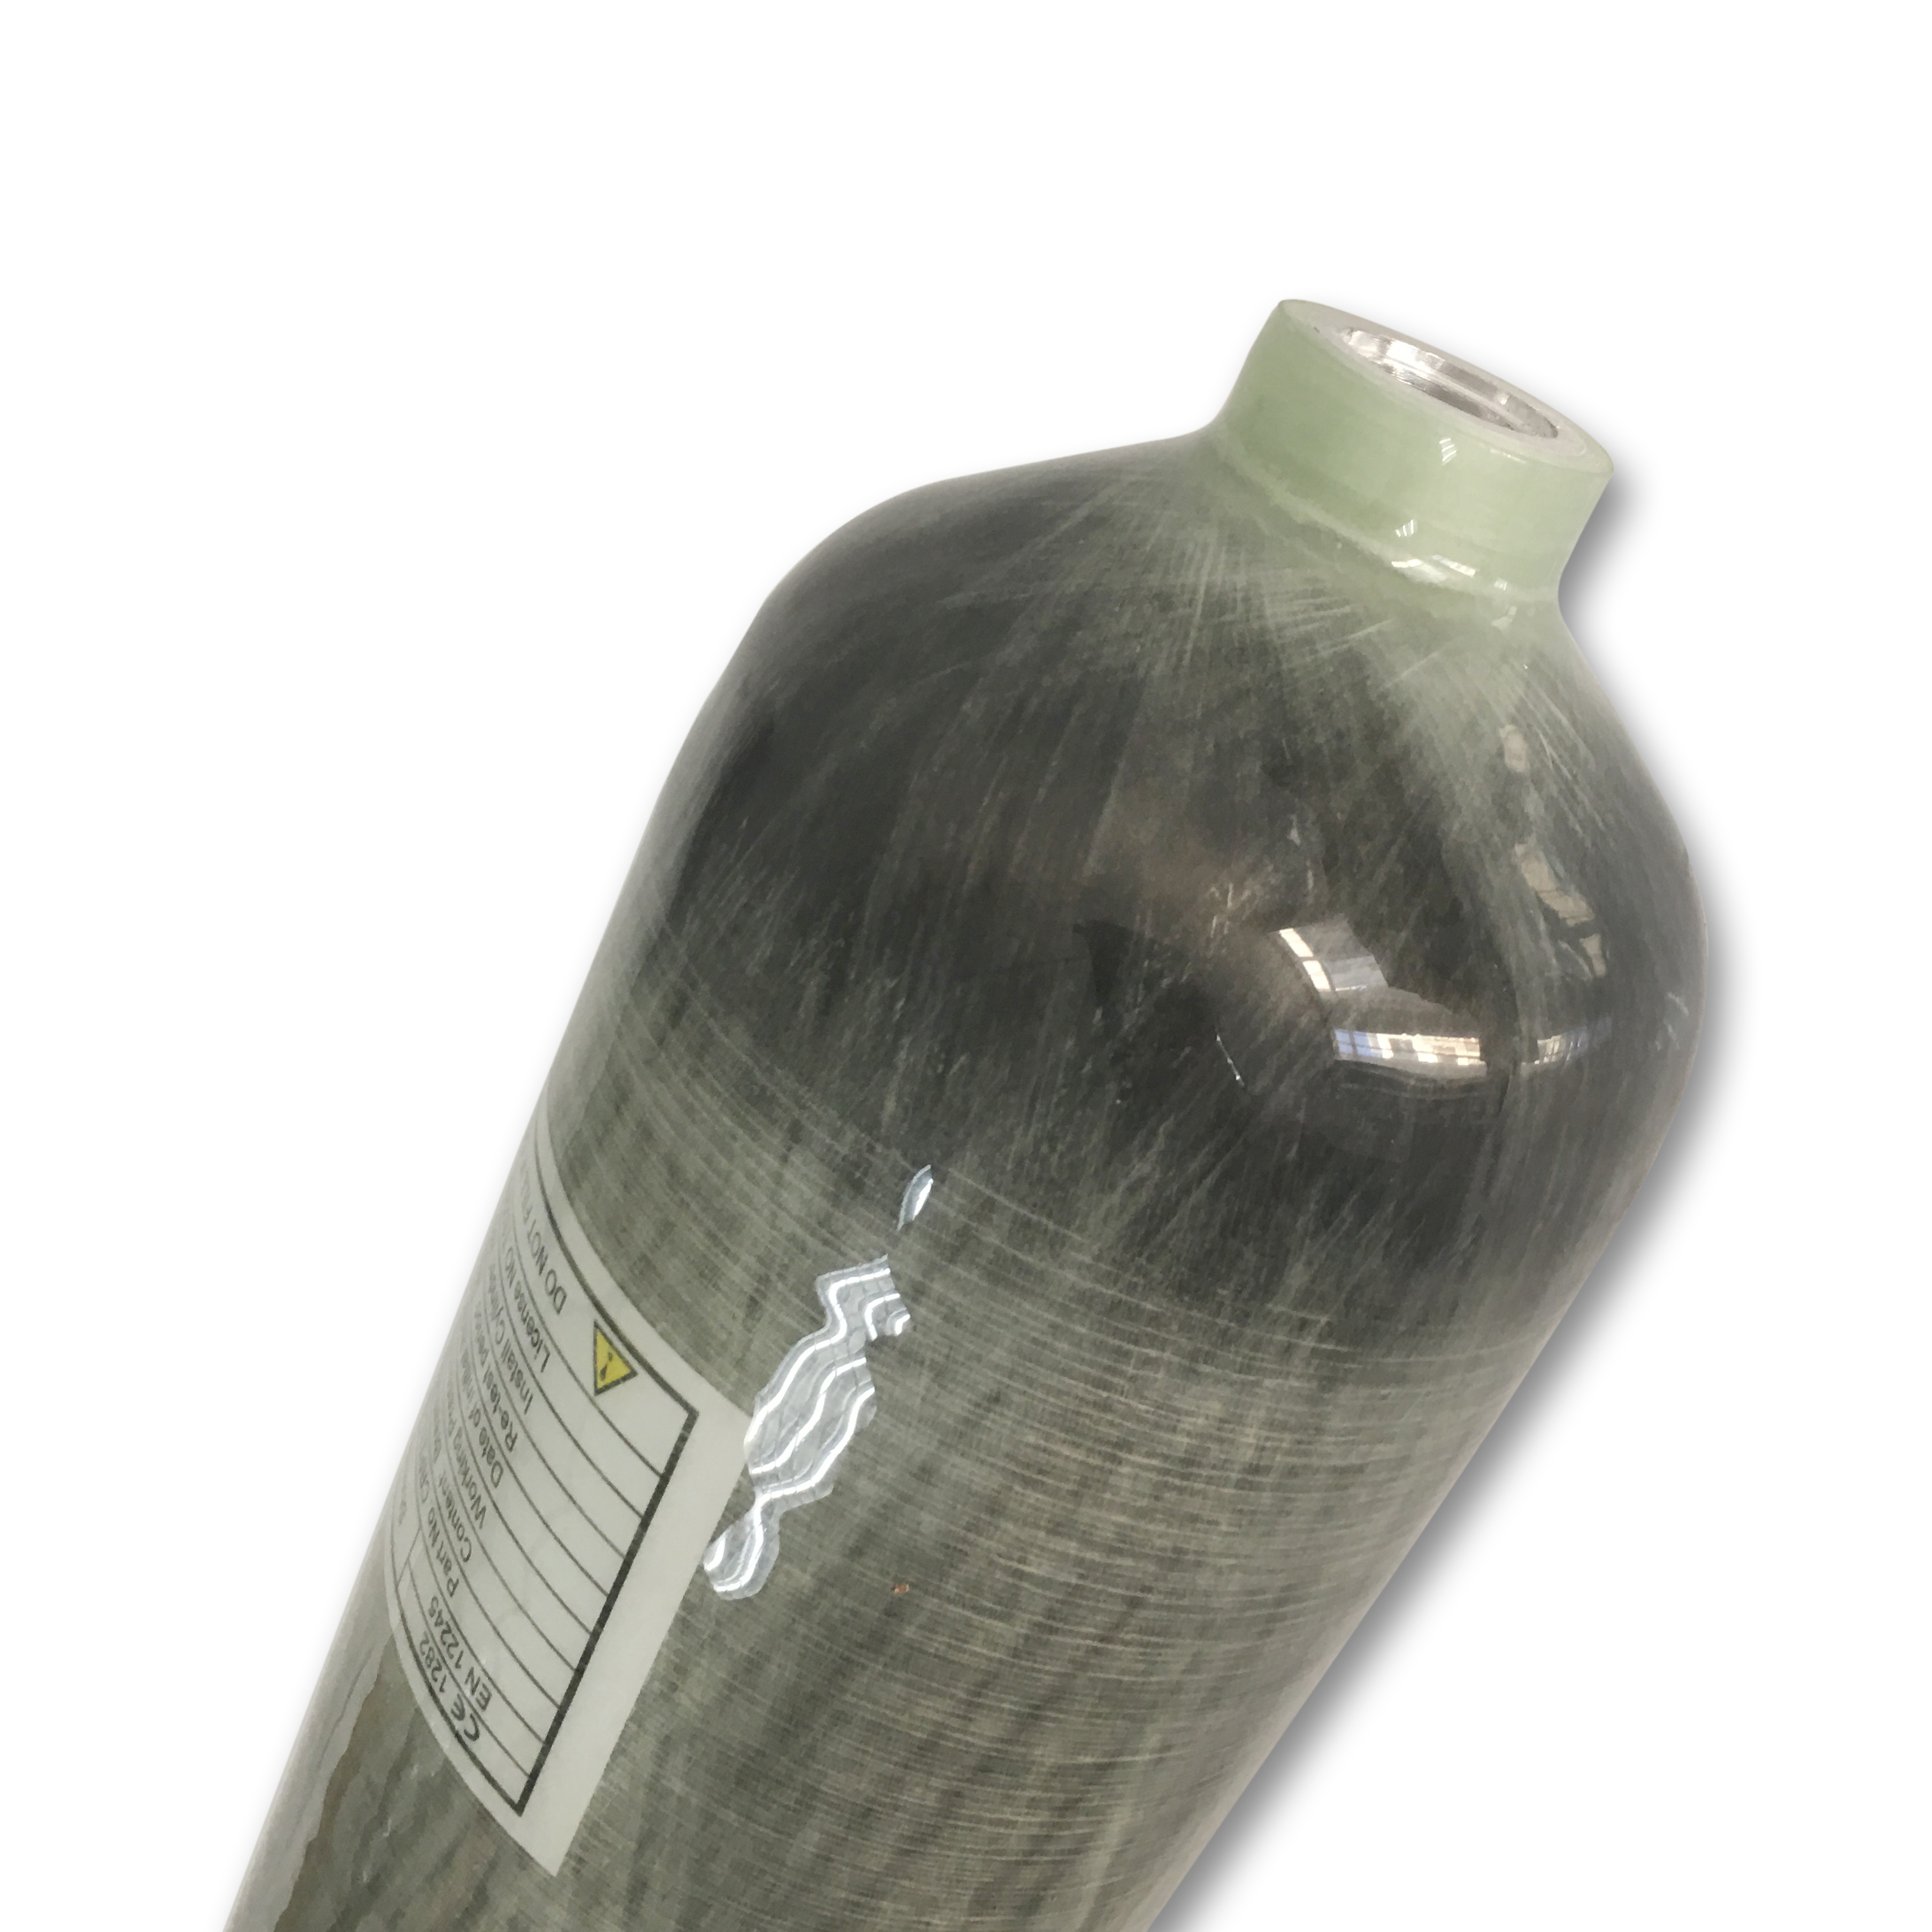 ACECARE 3L Carbon Tank/mini Scuba Tank HP 4500PSI Compressed Air Condor Pcp Composite Gas Cylinder Thread M18*1.5 EN12245 AC103